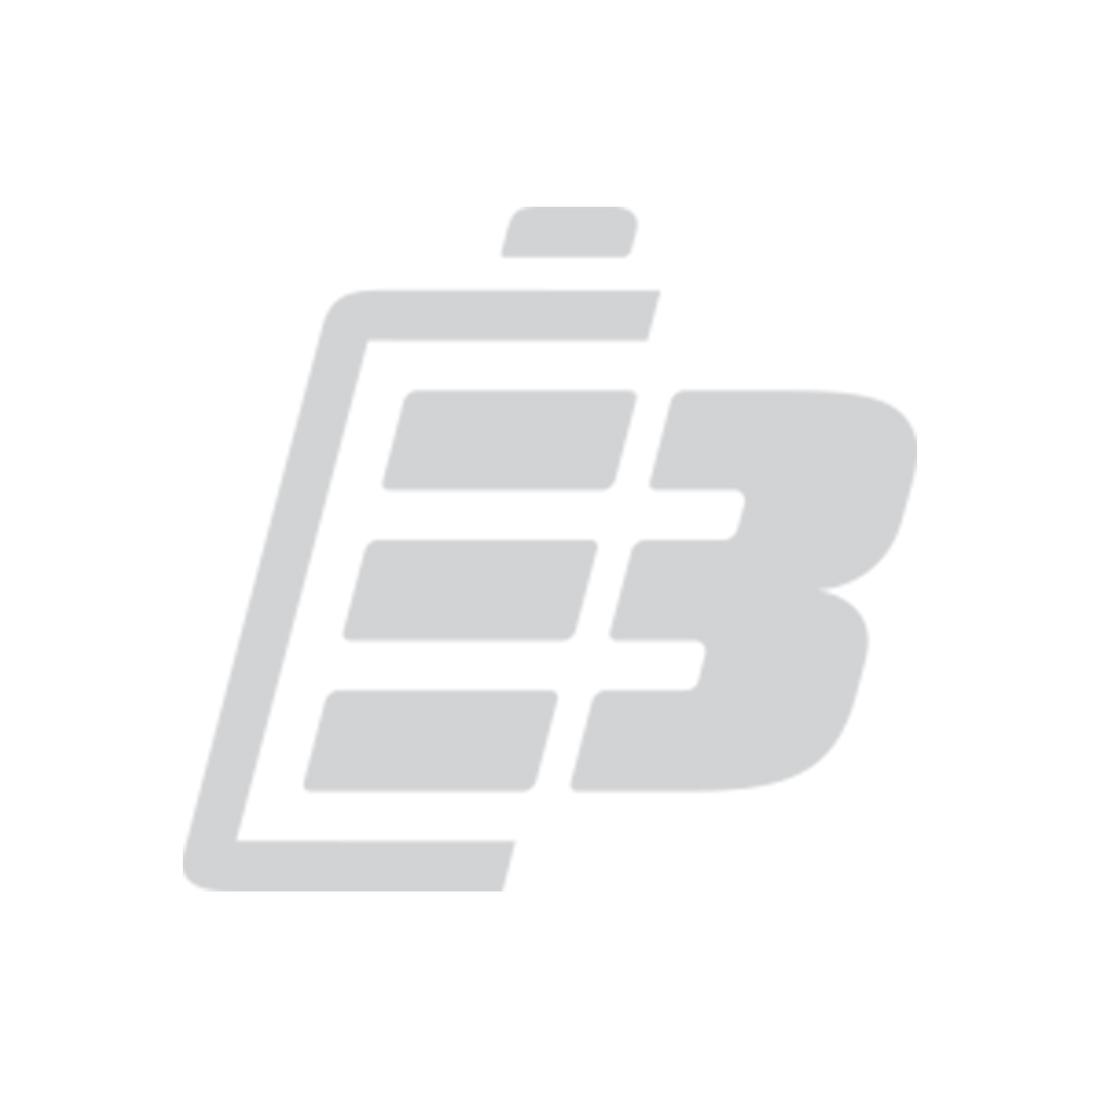 Survey tester battery Nikon Nivo C Total Station_1